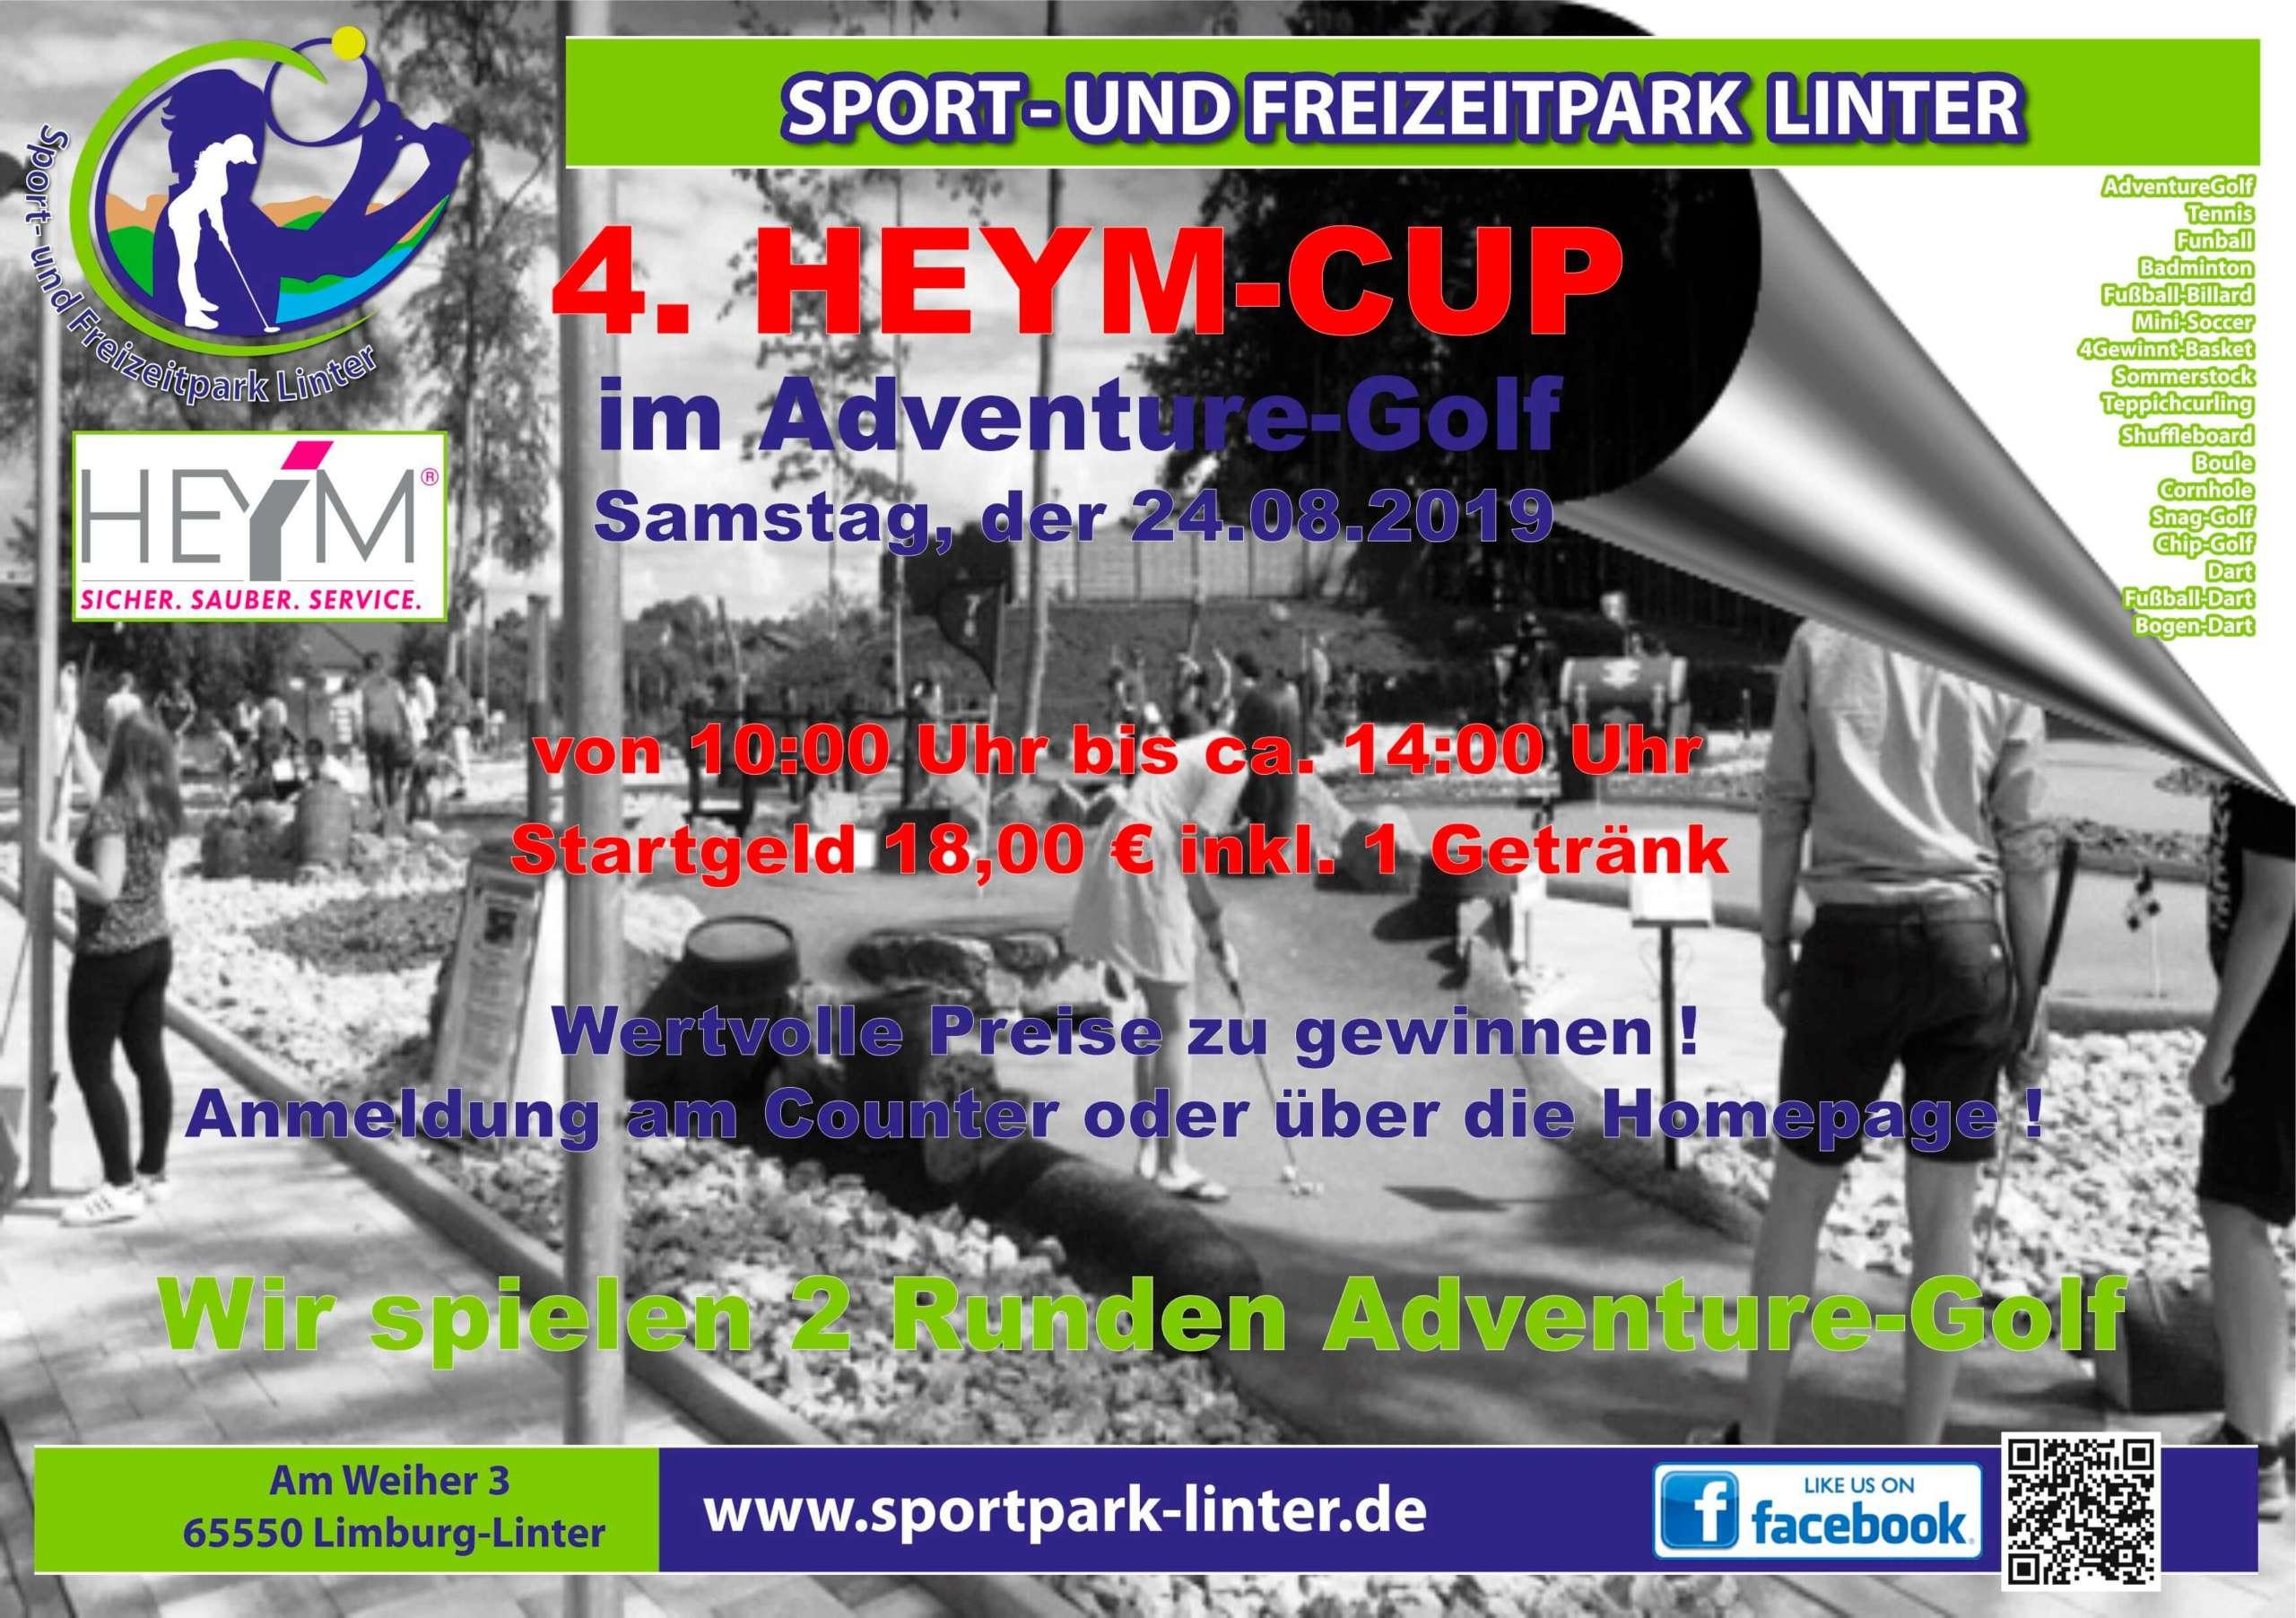 4. HEYM-CUP 2019